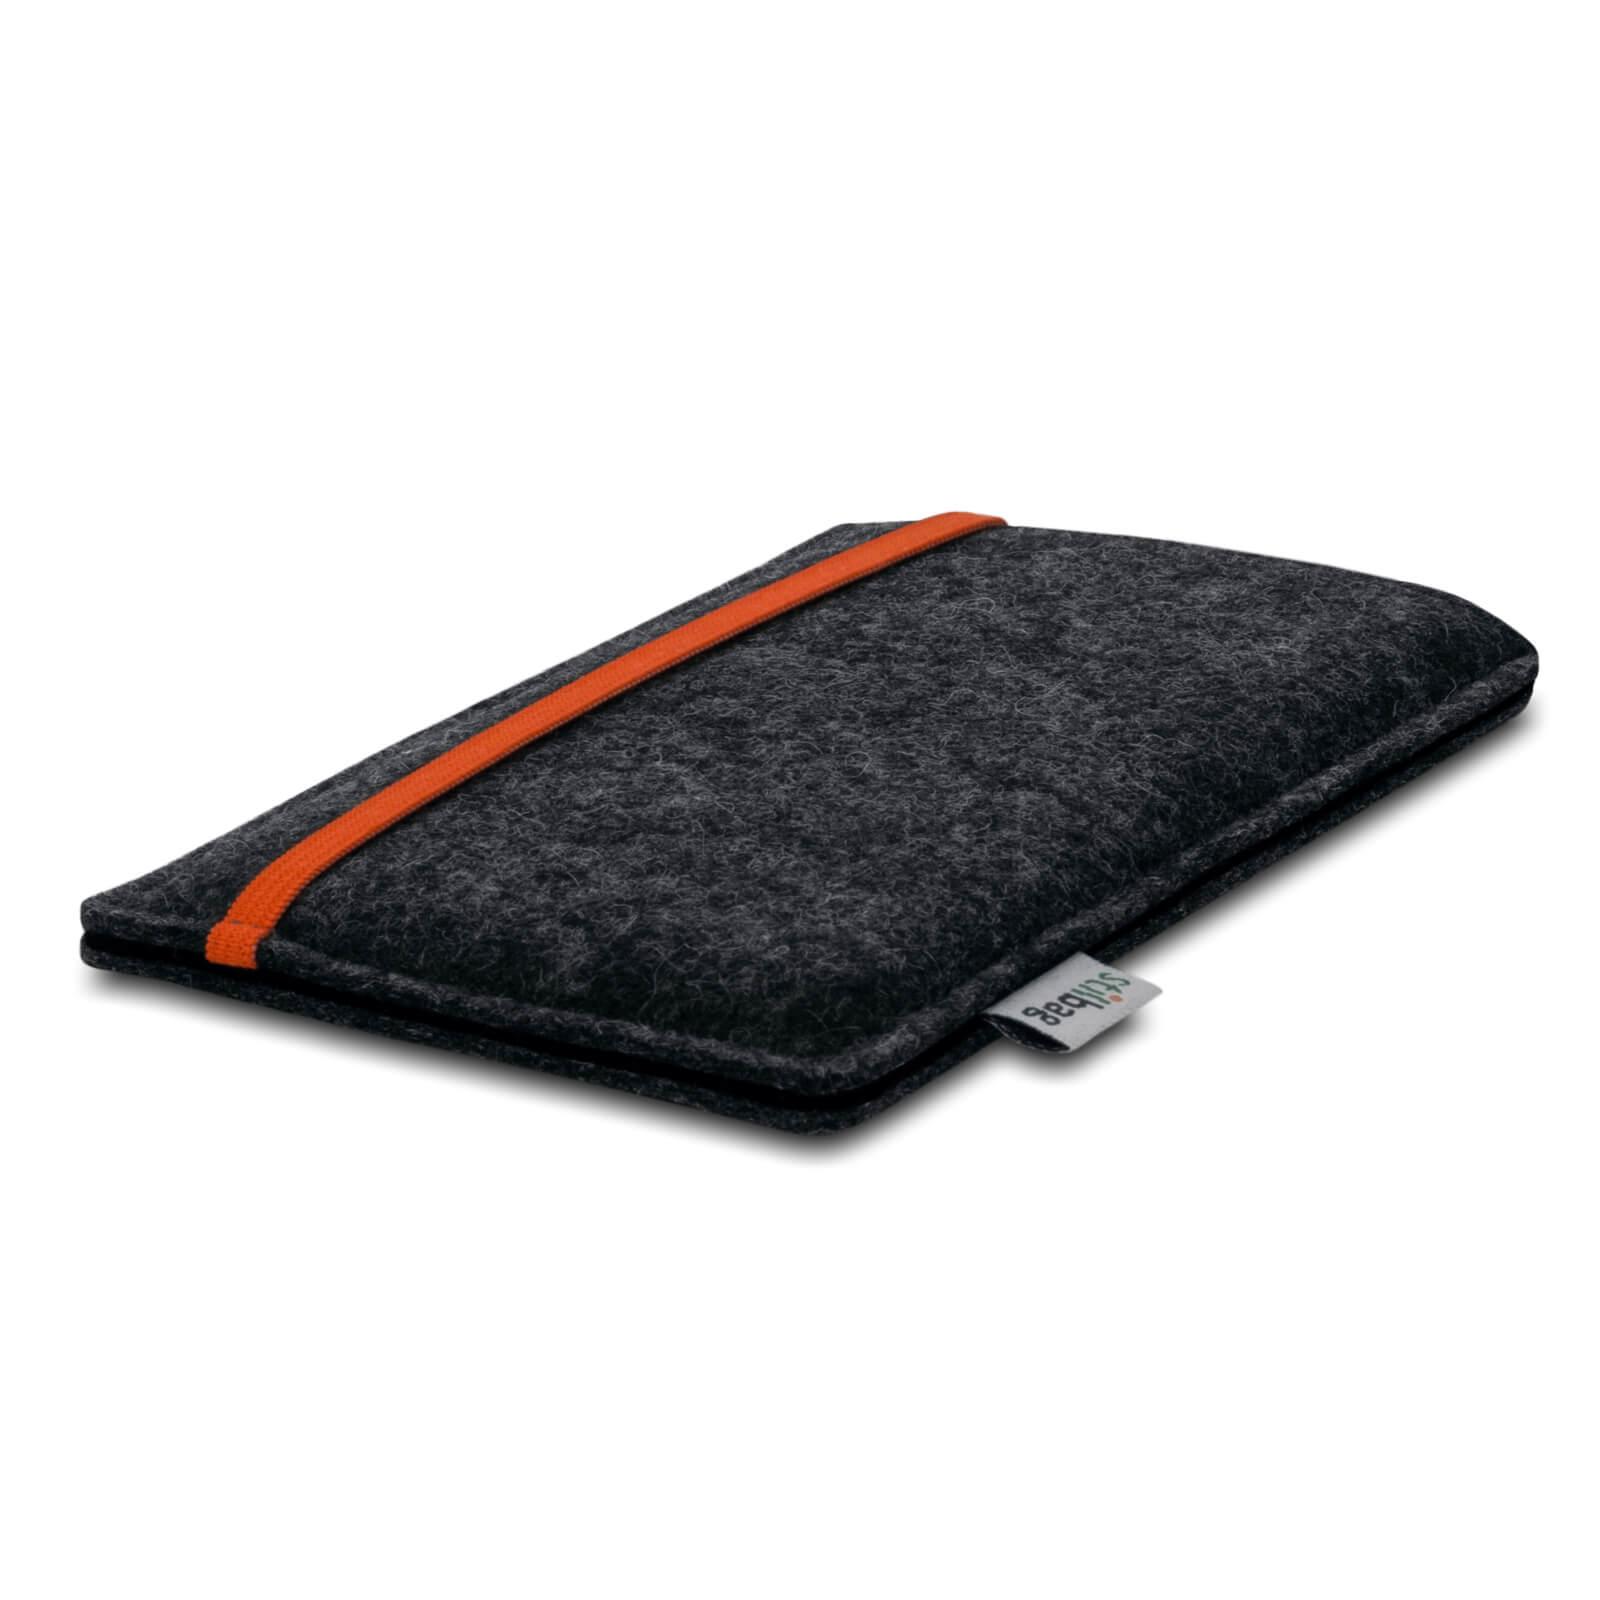 Stilbag-Feutre-Housse-mobile-Pochette-Etui-LEON-HTC-One-X-Plus-anthracite